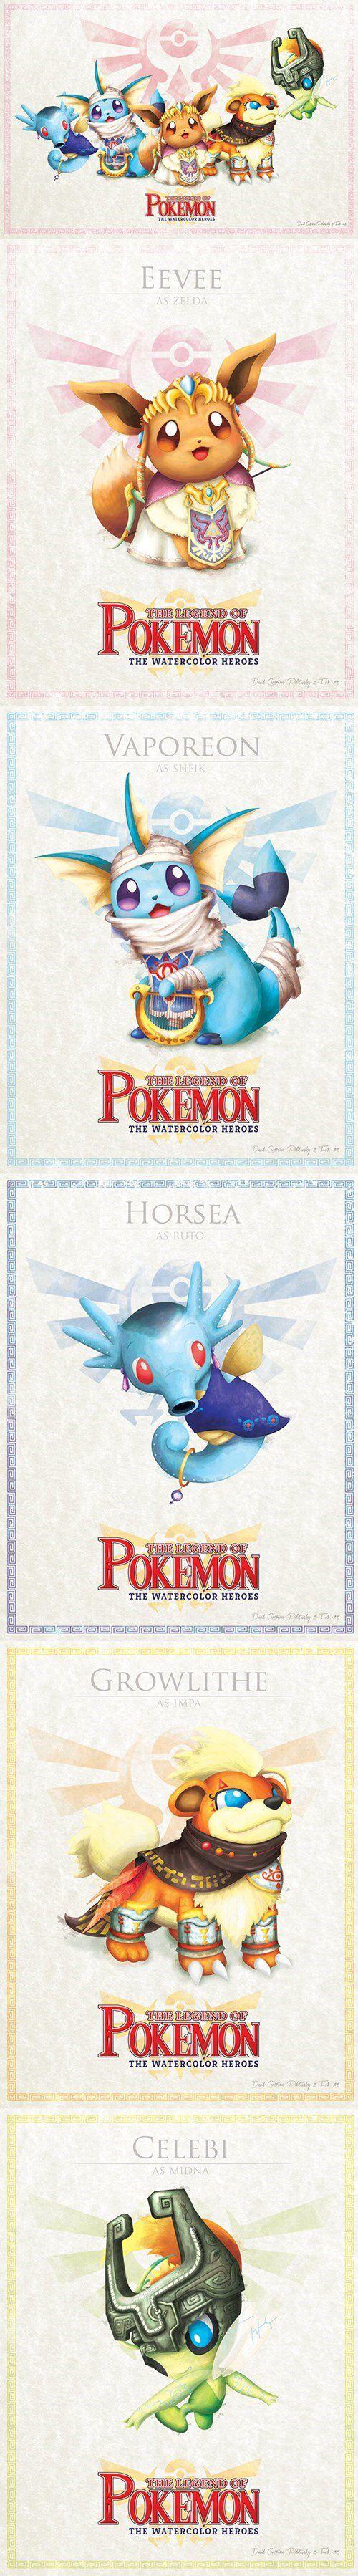 Princess Zelda is an Eeveelution http://chzb.gr/1Hr5BGm